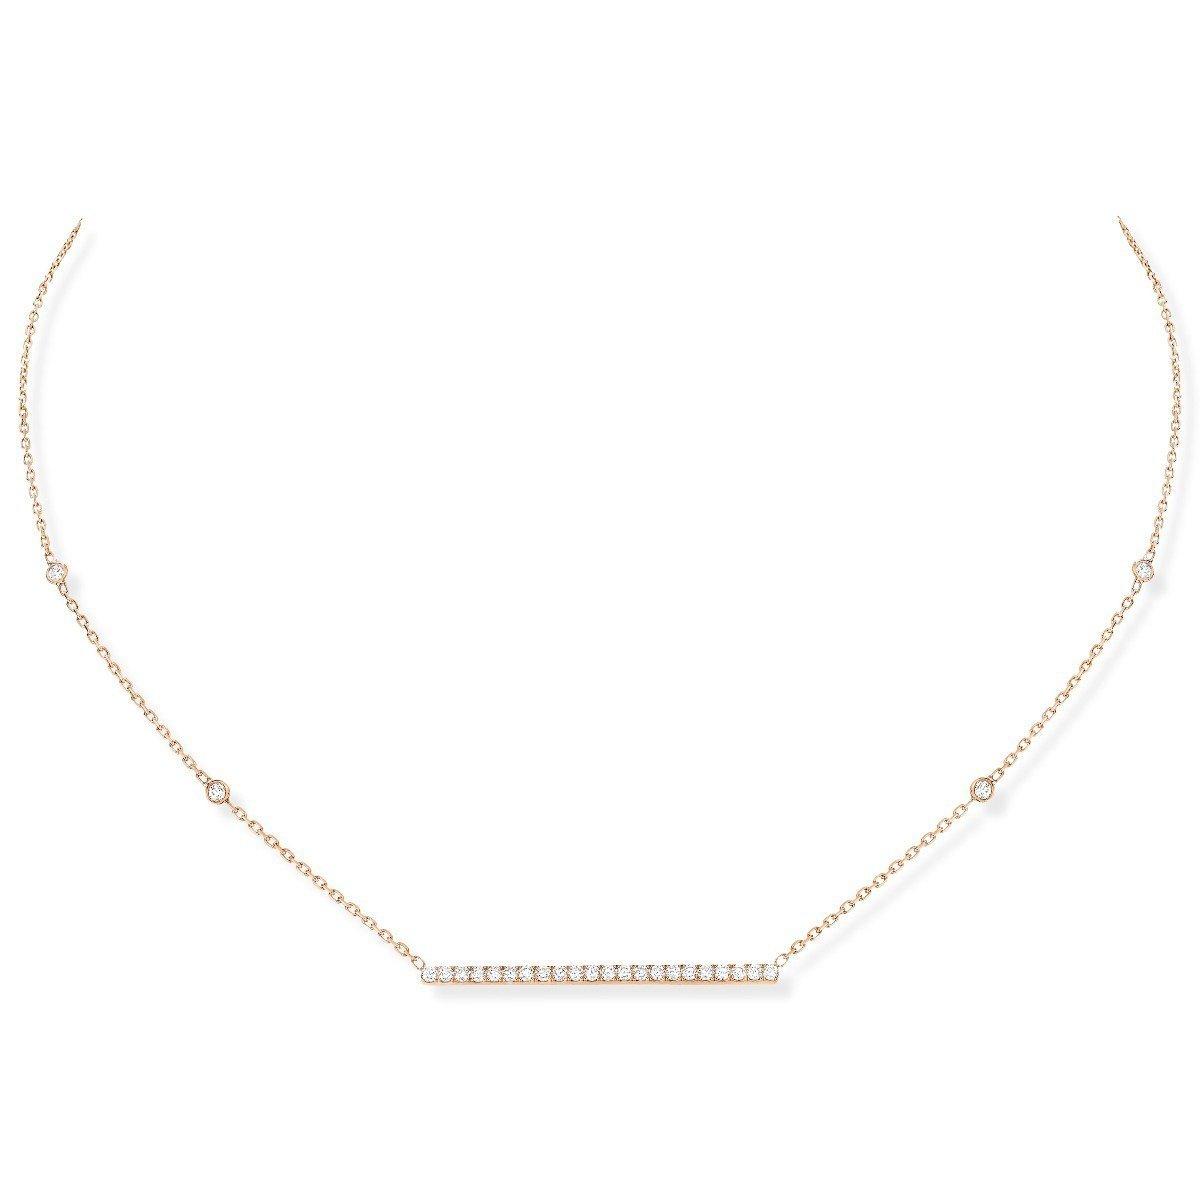 Collier Messika Gatsby Barrette Horizontale en or rose et diamants vue 1